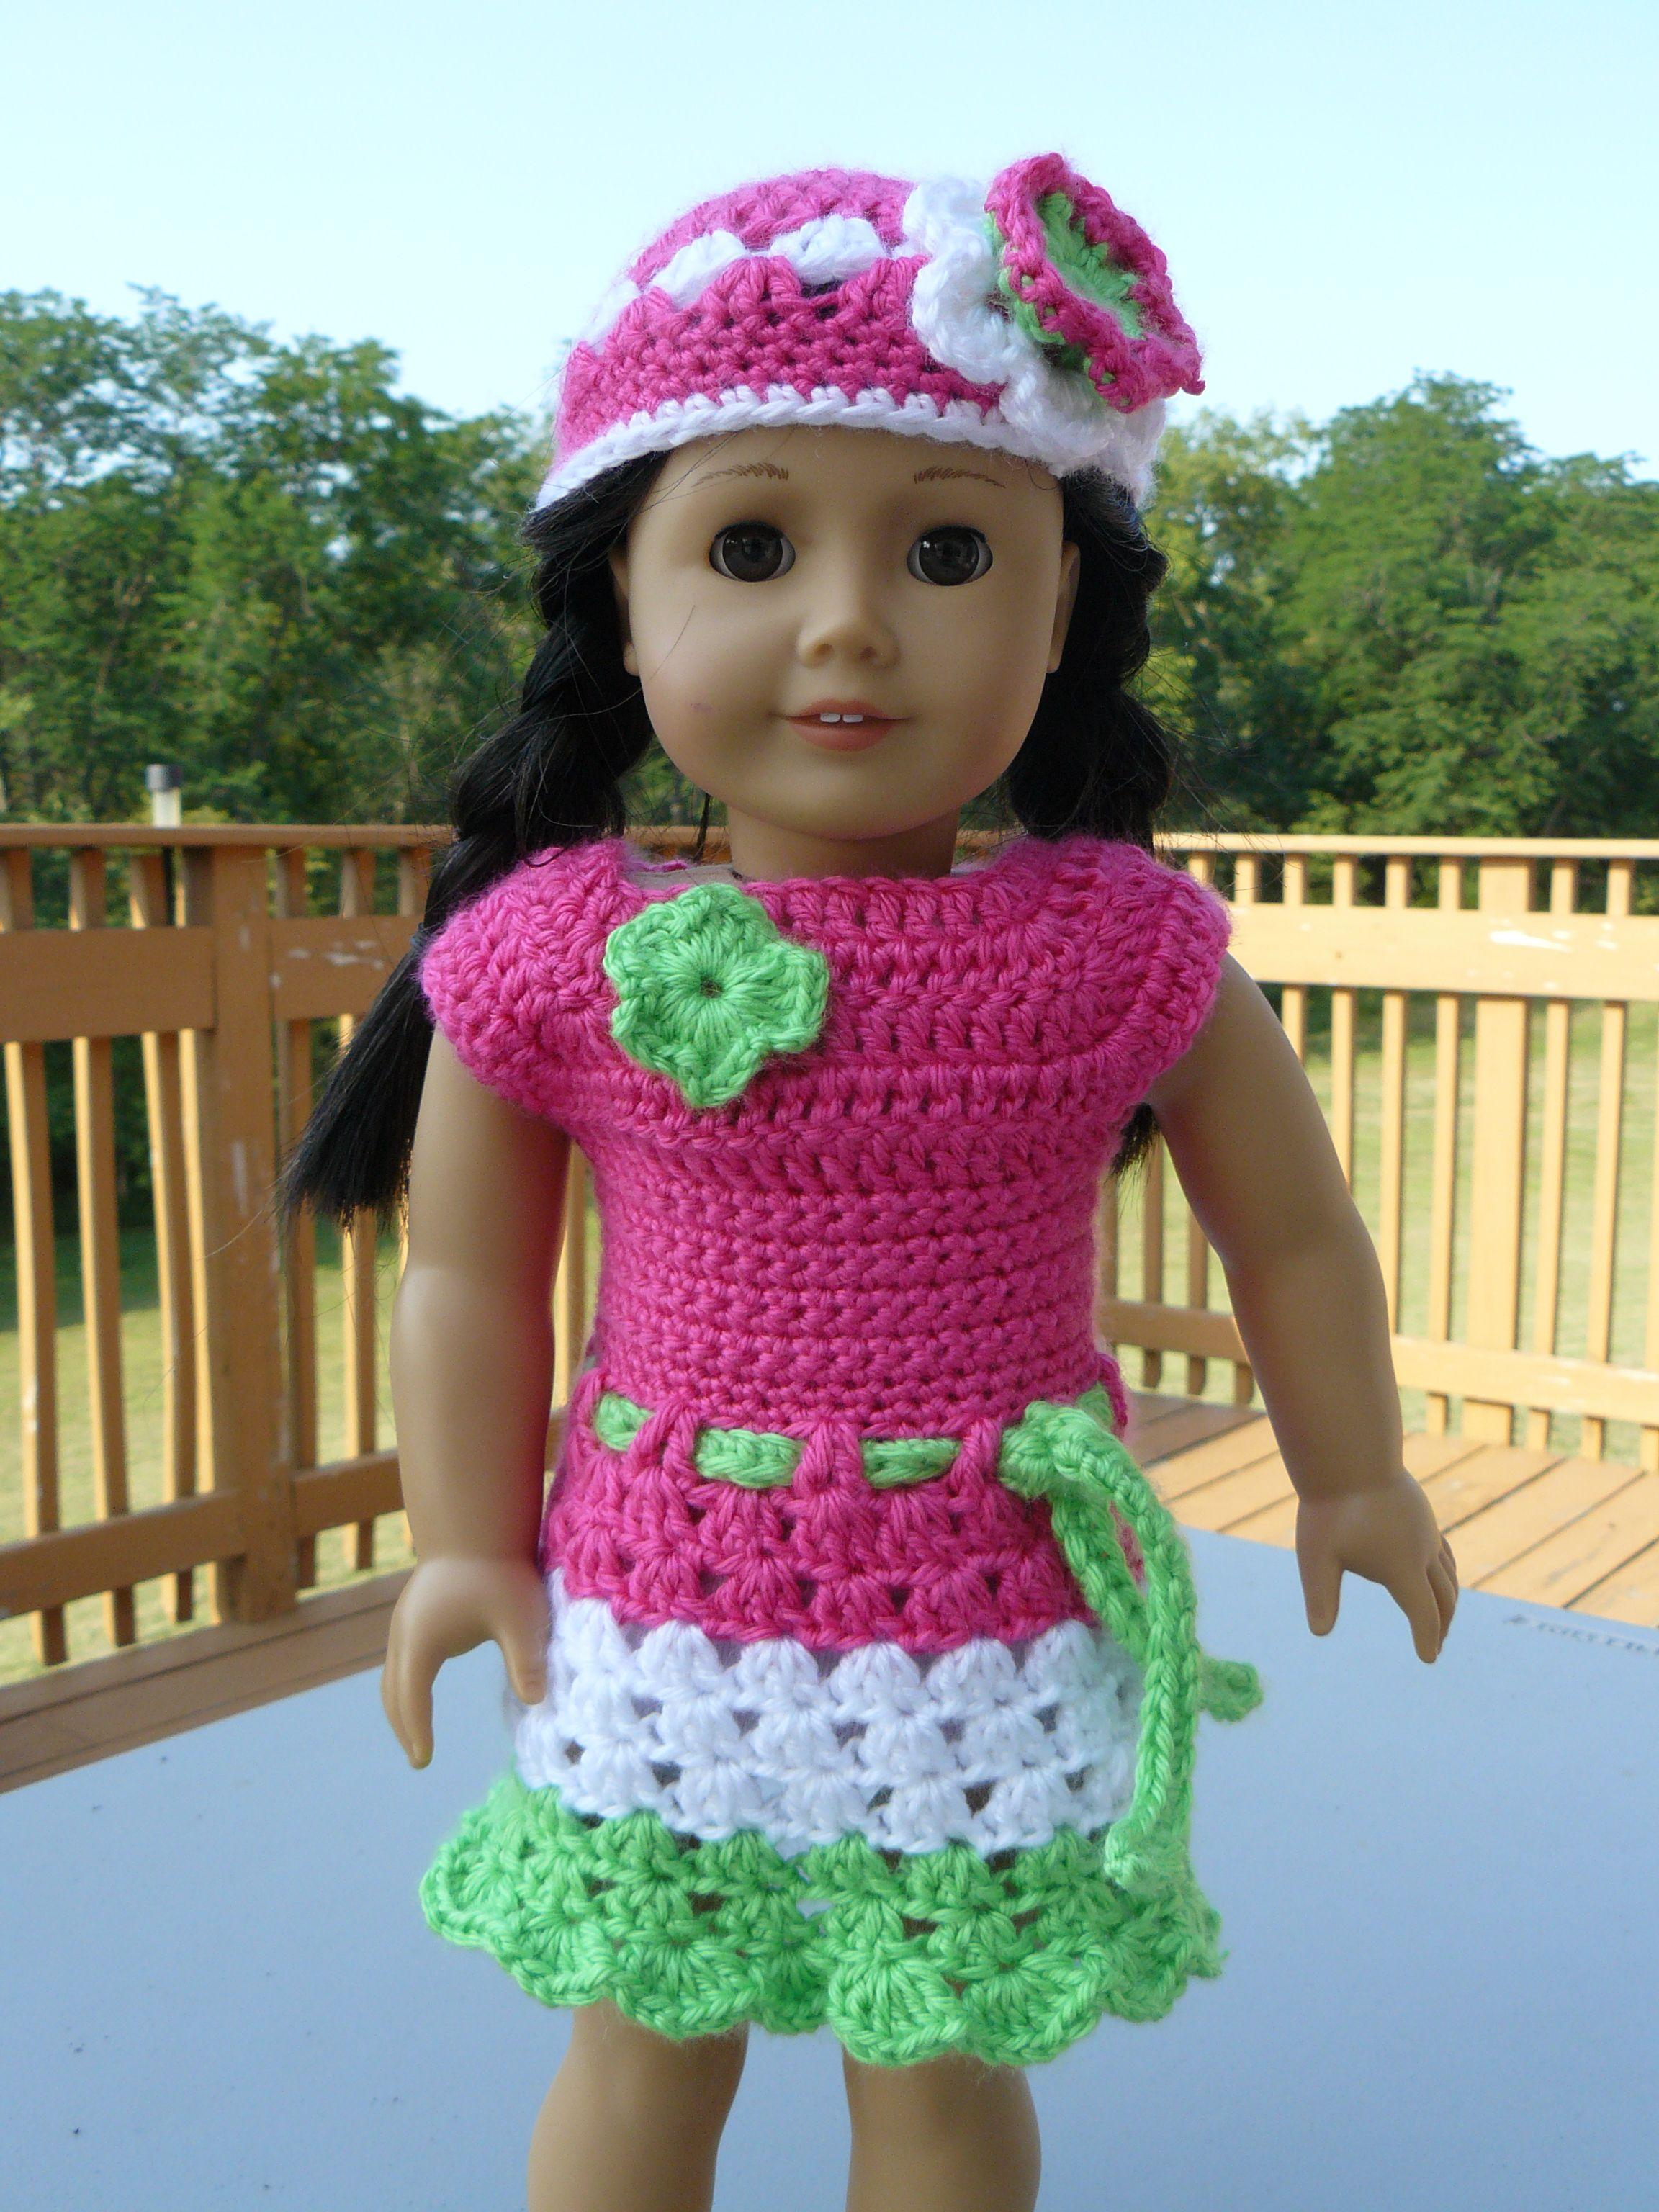 Pin on Crochet Ideas